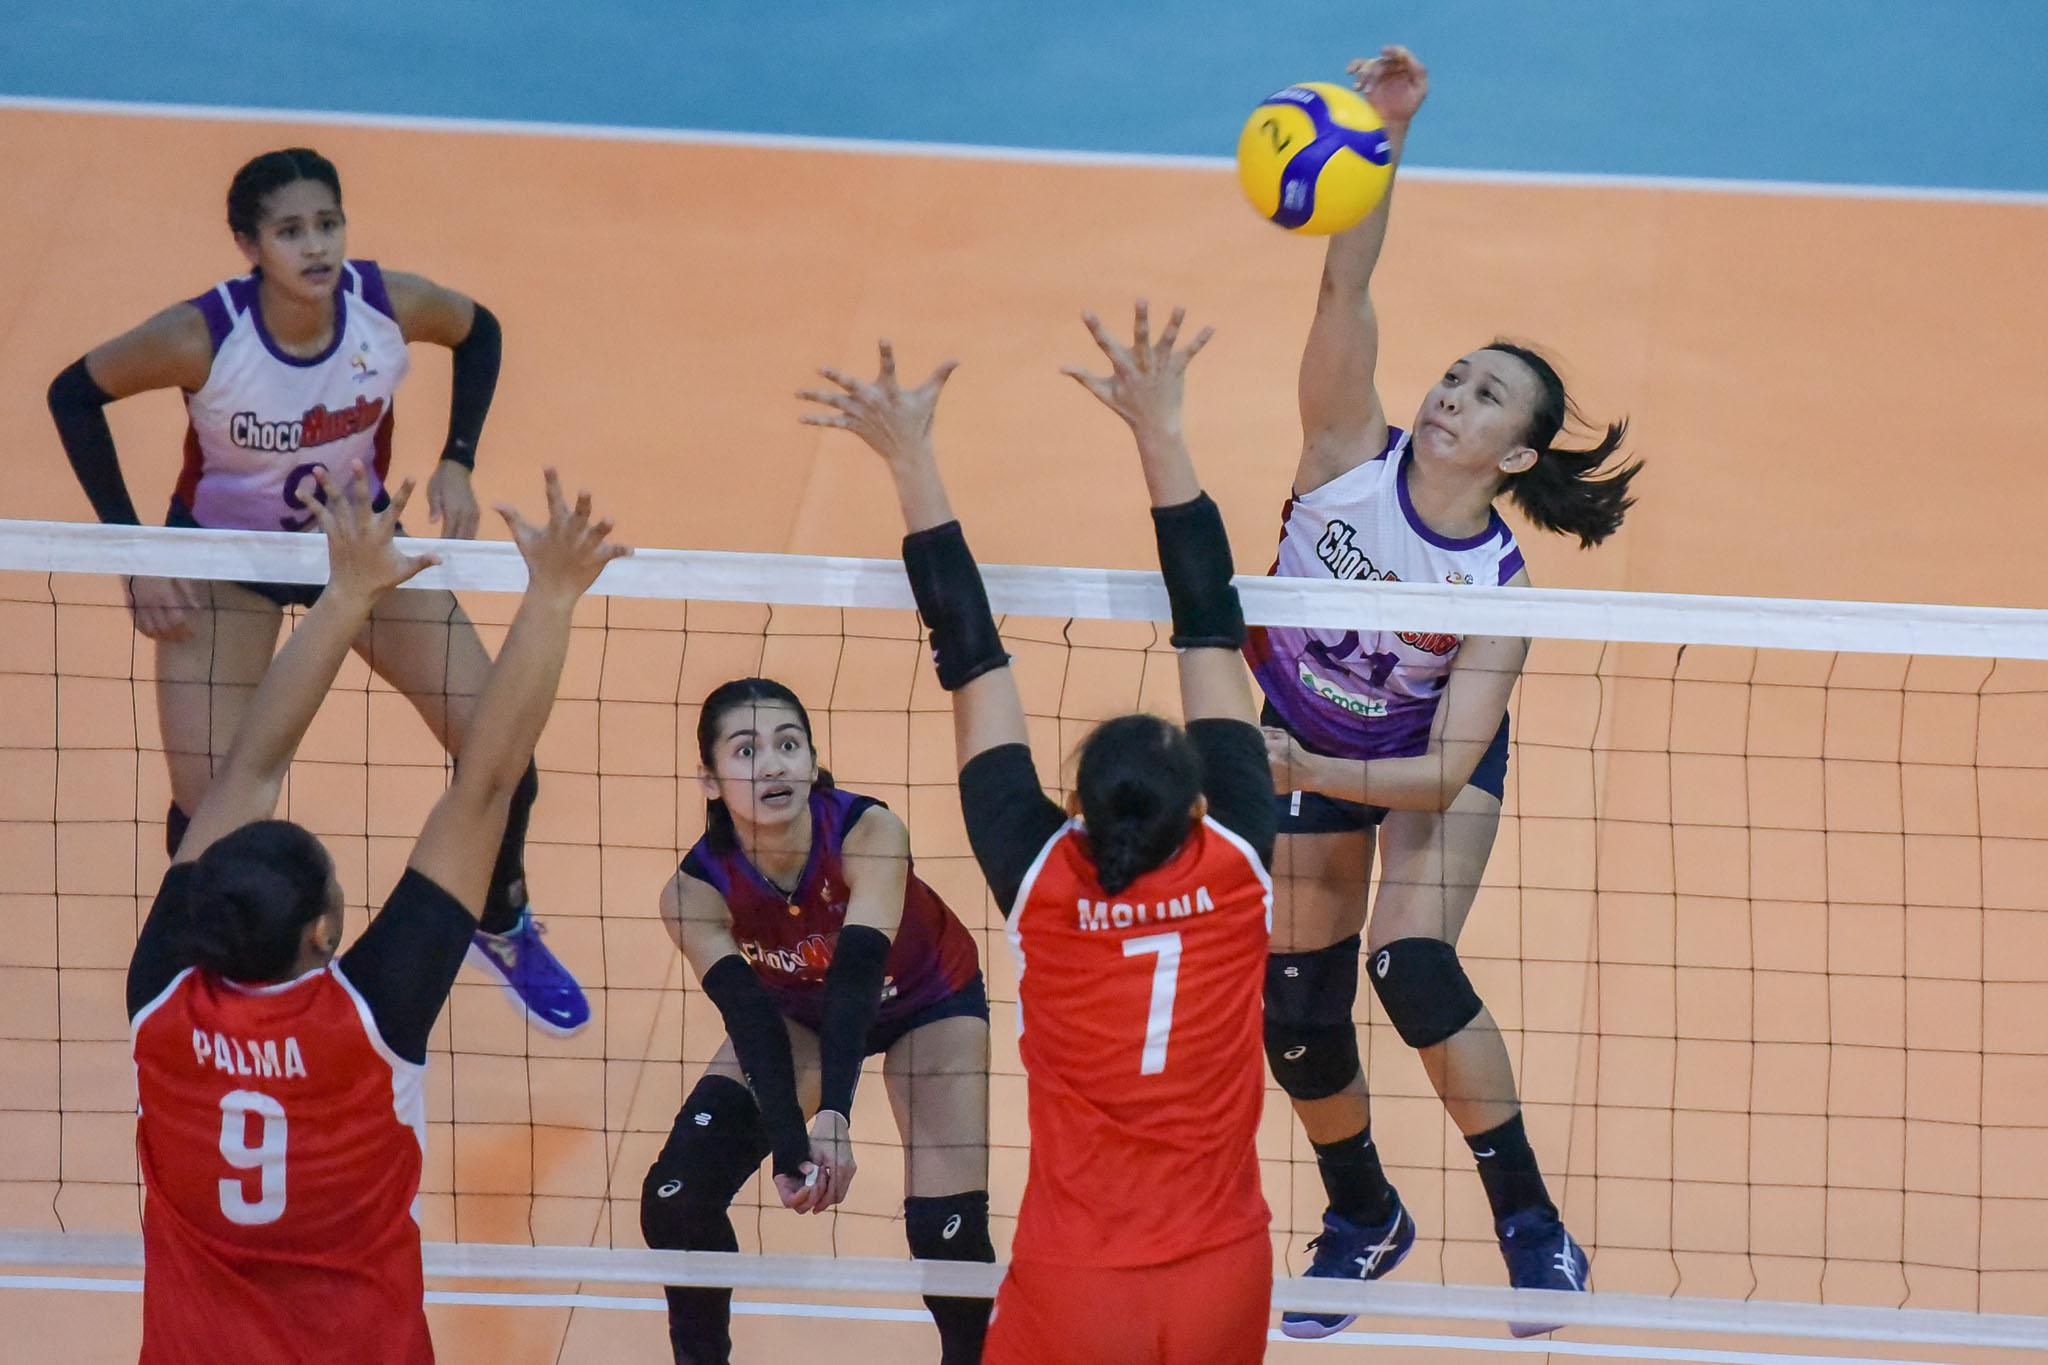 2021-PVL-Open-Petrogazz-vs.-Choco-Mucho-Regine-Arocha-9661 Arocha admits struggles in adjusting to Choco Mucho News PVL Volleyball  - philippine sports news